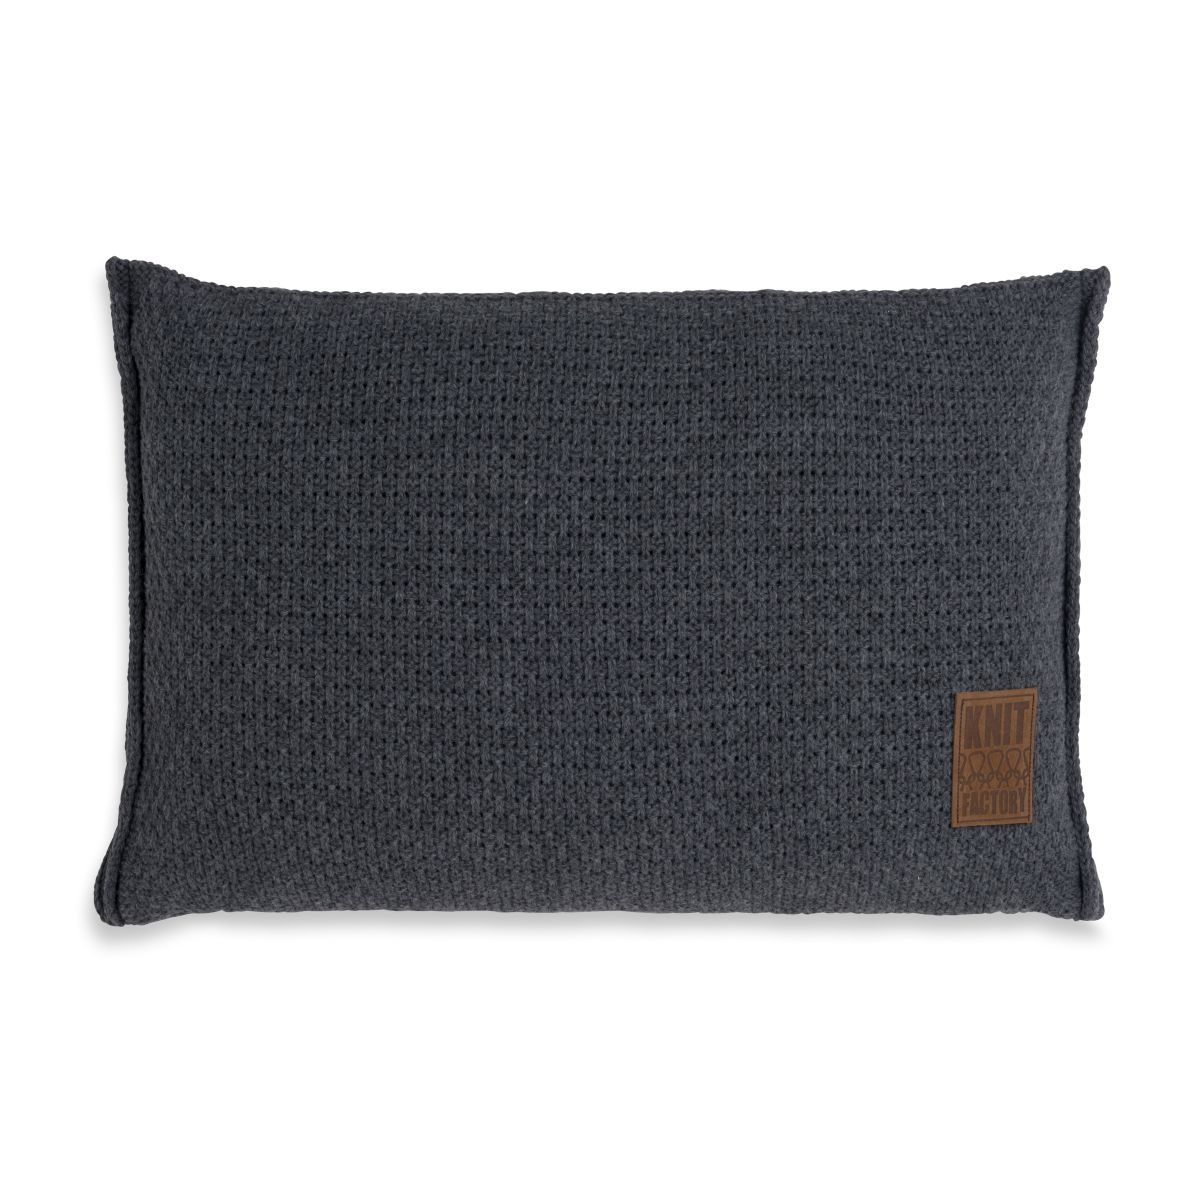 knit factory 1091310 kussen 60x40 jesse antraciet 1